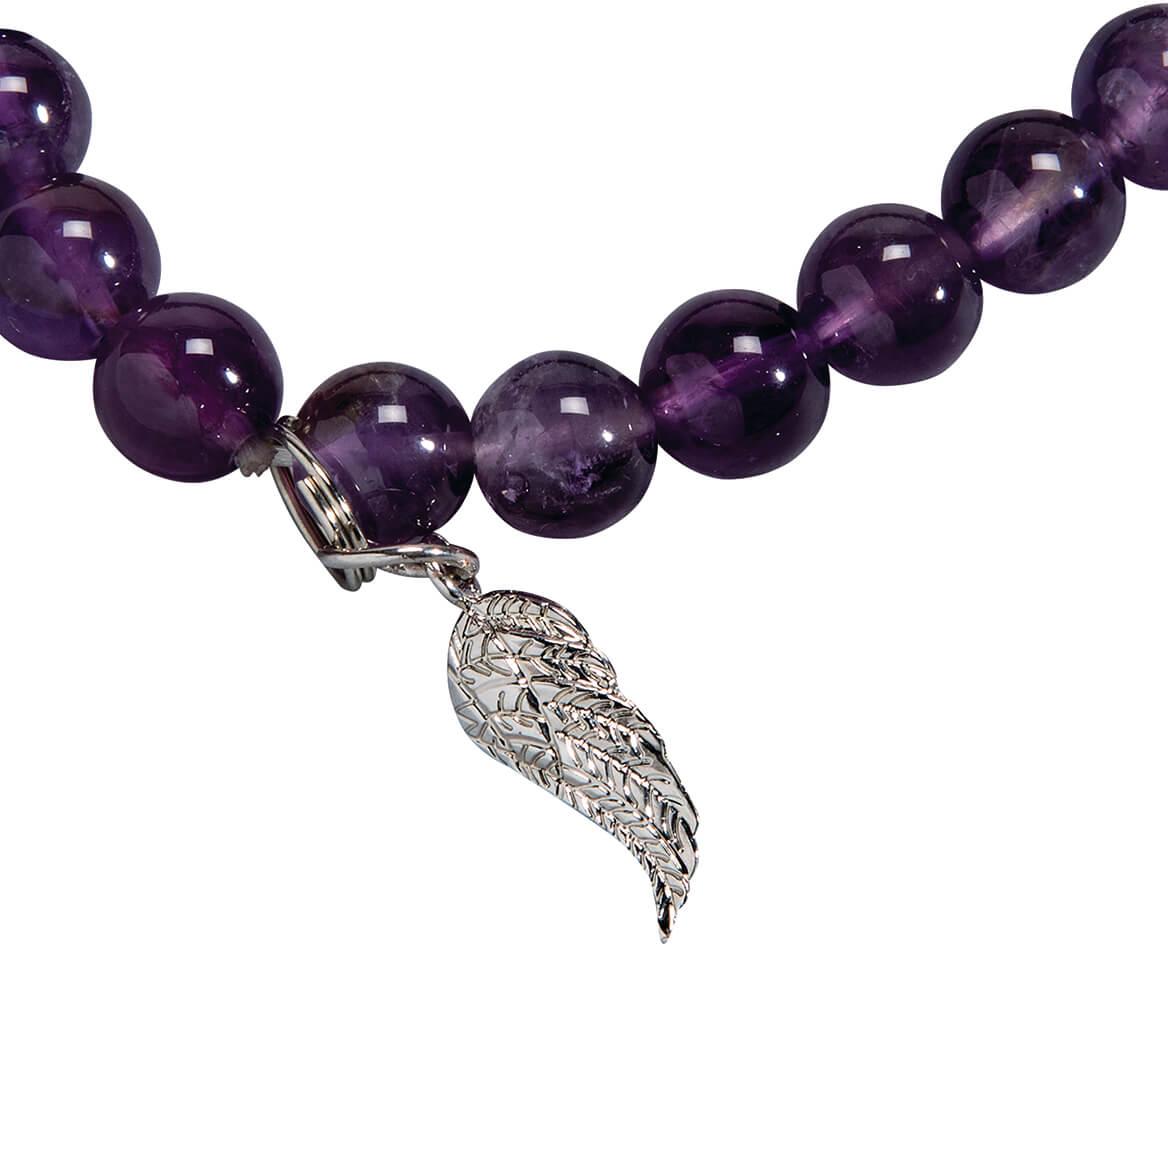 Amethyst and Angel Wing Stretch Bracelet-368332